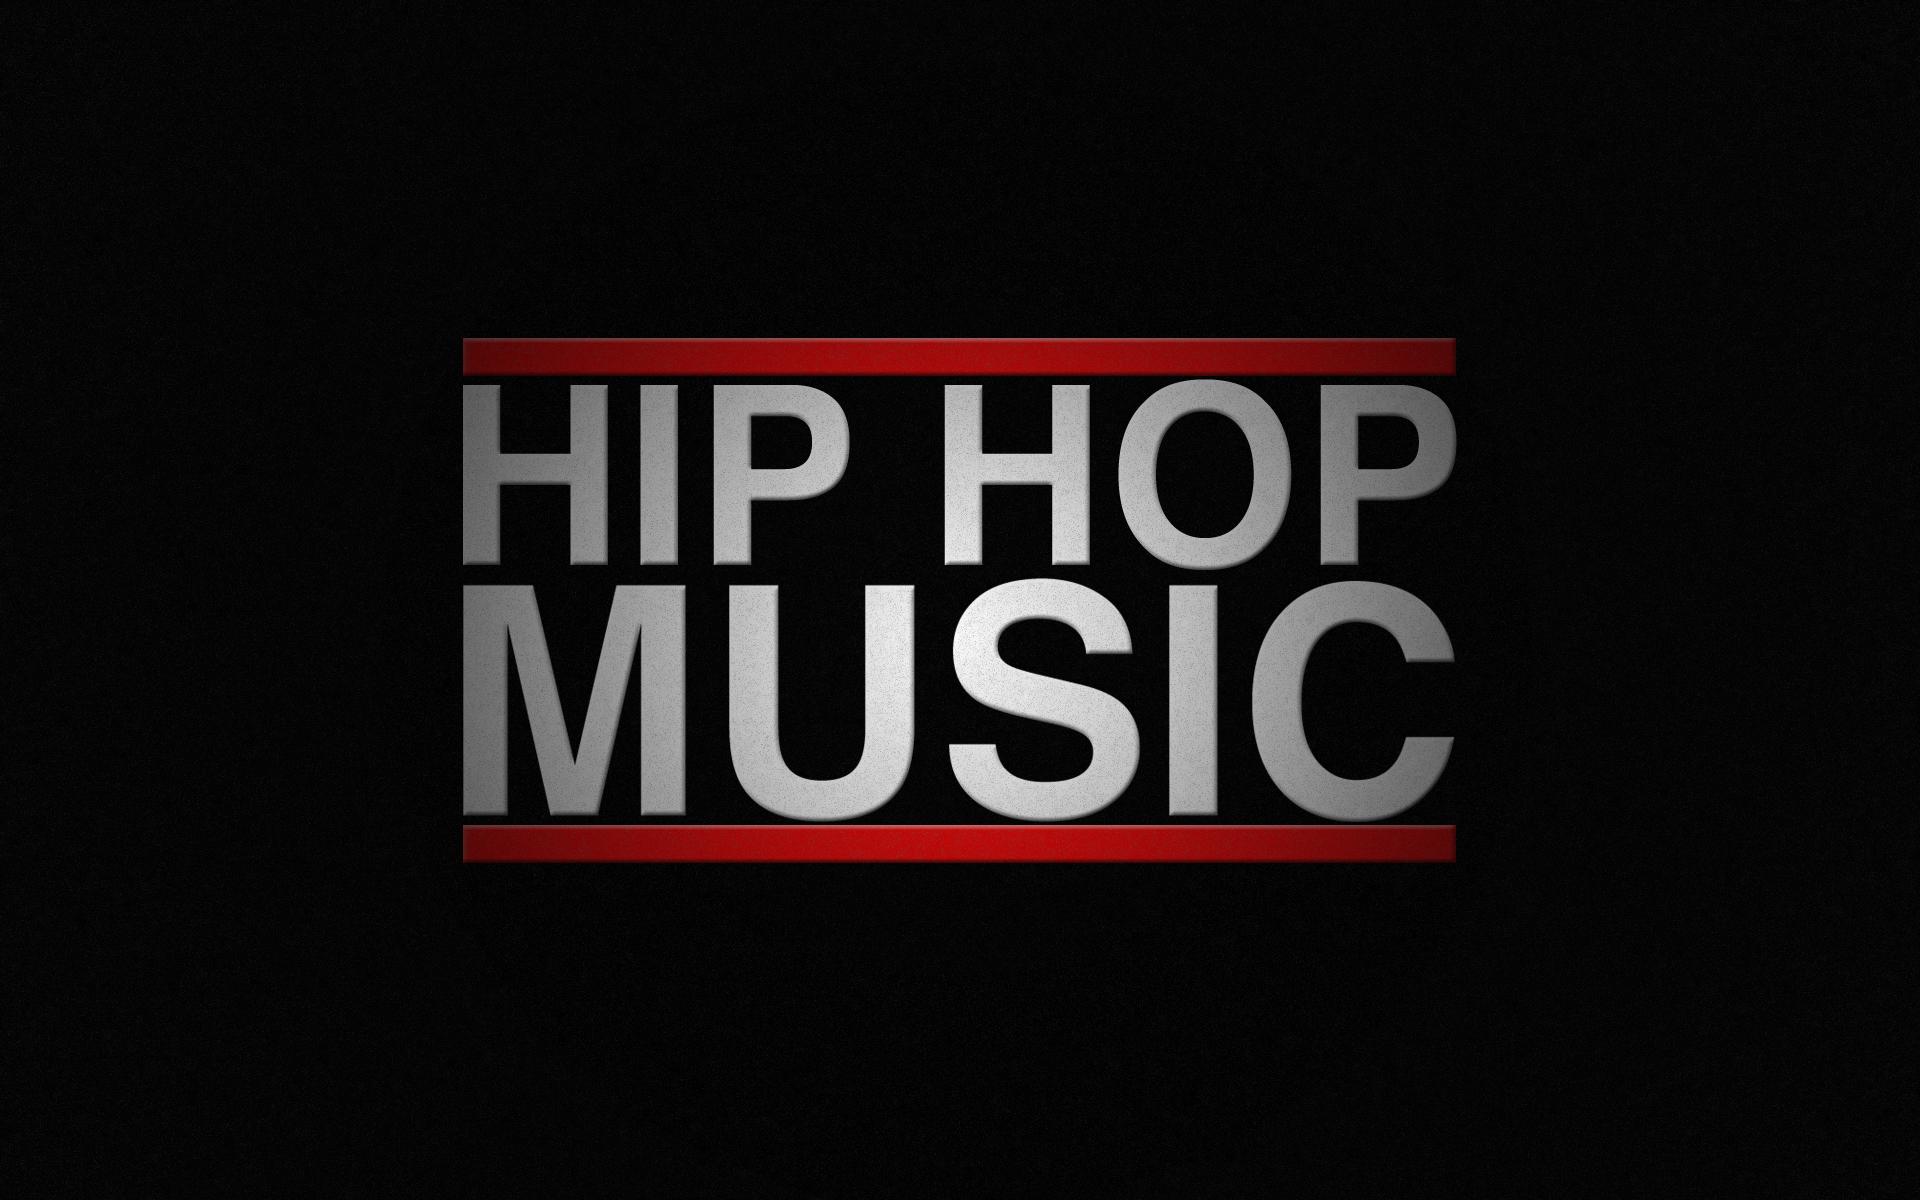 Hd hip hop wallpapers wallpapersafari hip hop dance wallpaper hd 11225 wallpaper wallpaper screen 1920x1200 voltagebd Choice Image